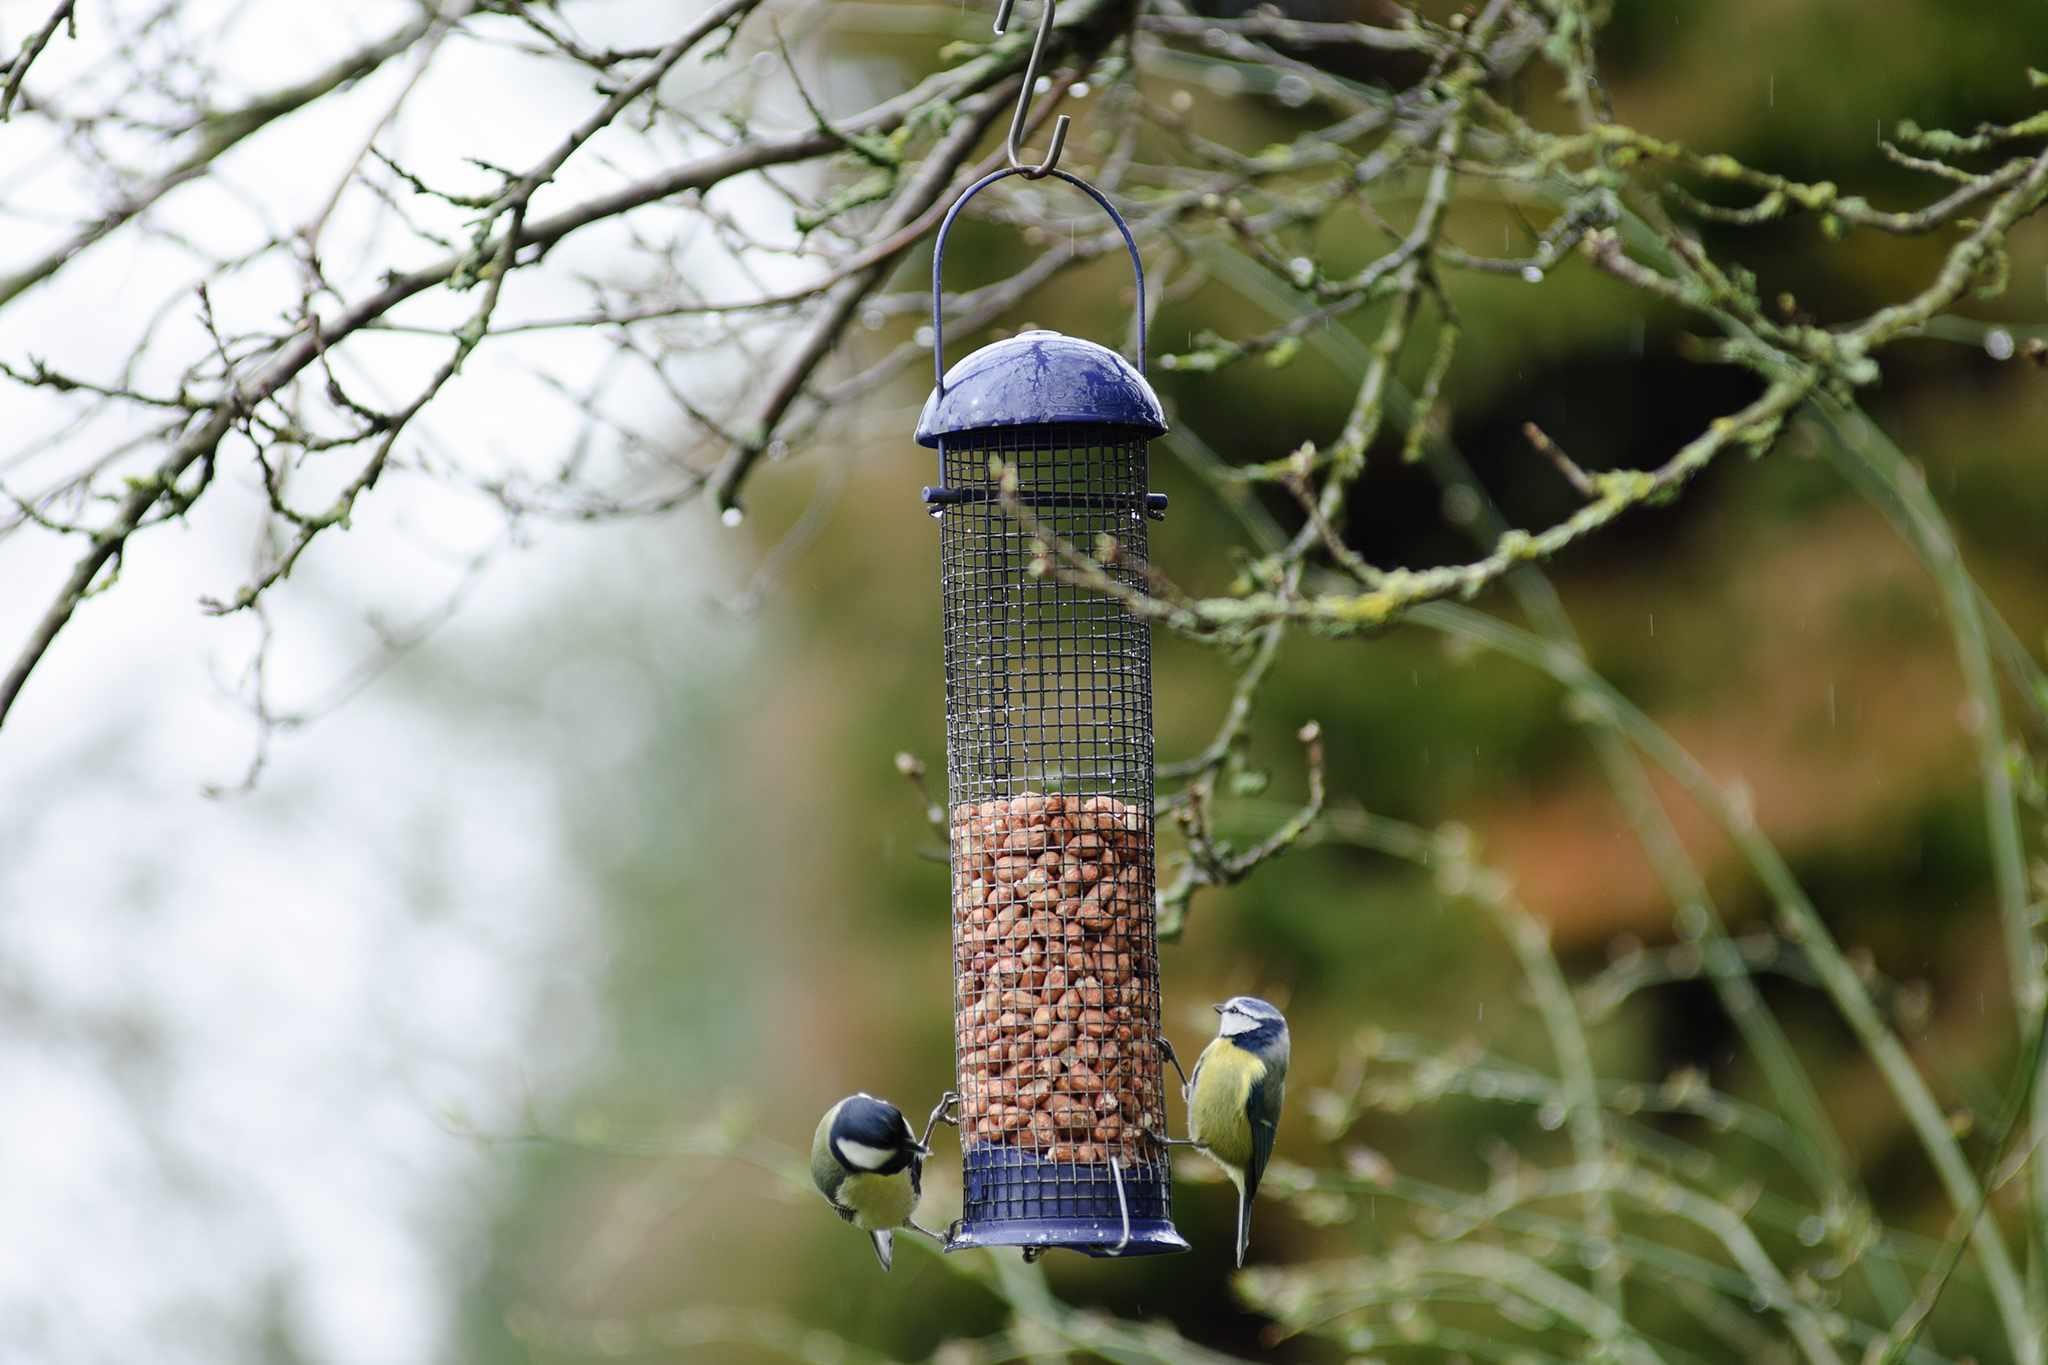 Birds on a bird feeder